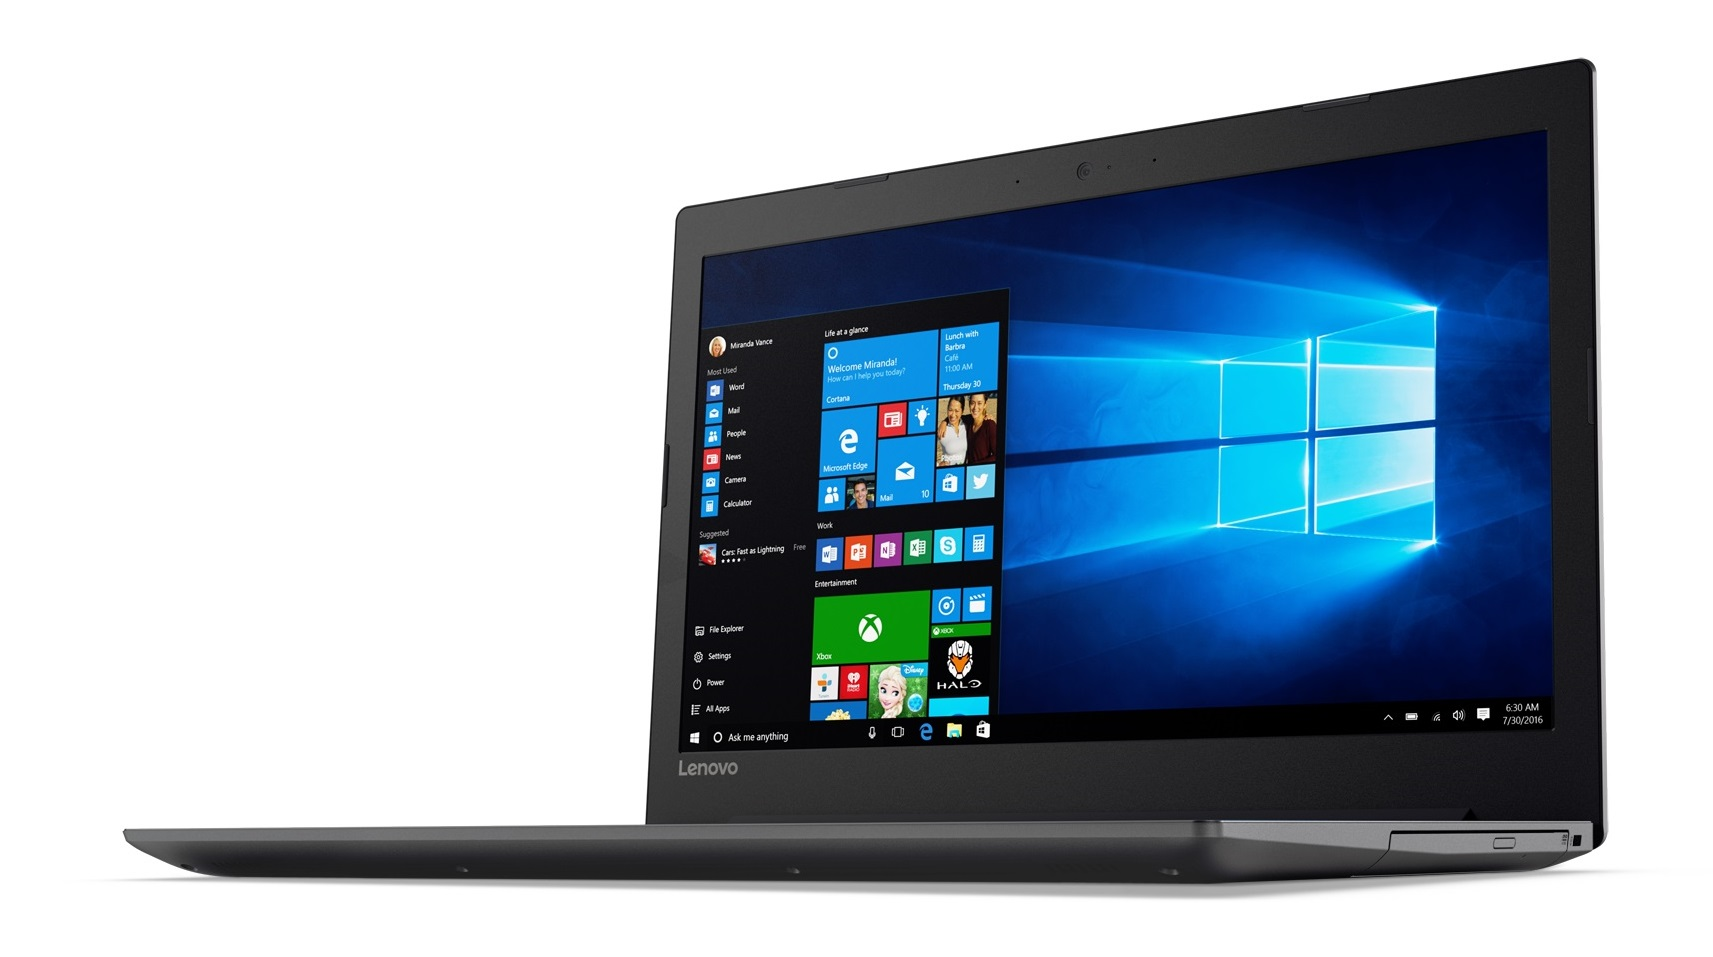 Фото  Ноутбук Lenovo ideapad 320-15IKB Onyx Black (81BG00QMRA)